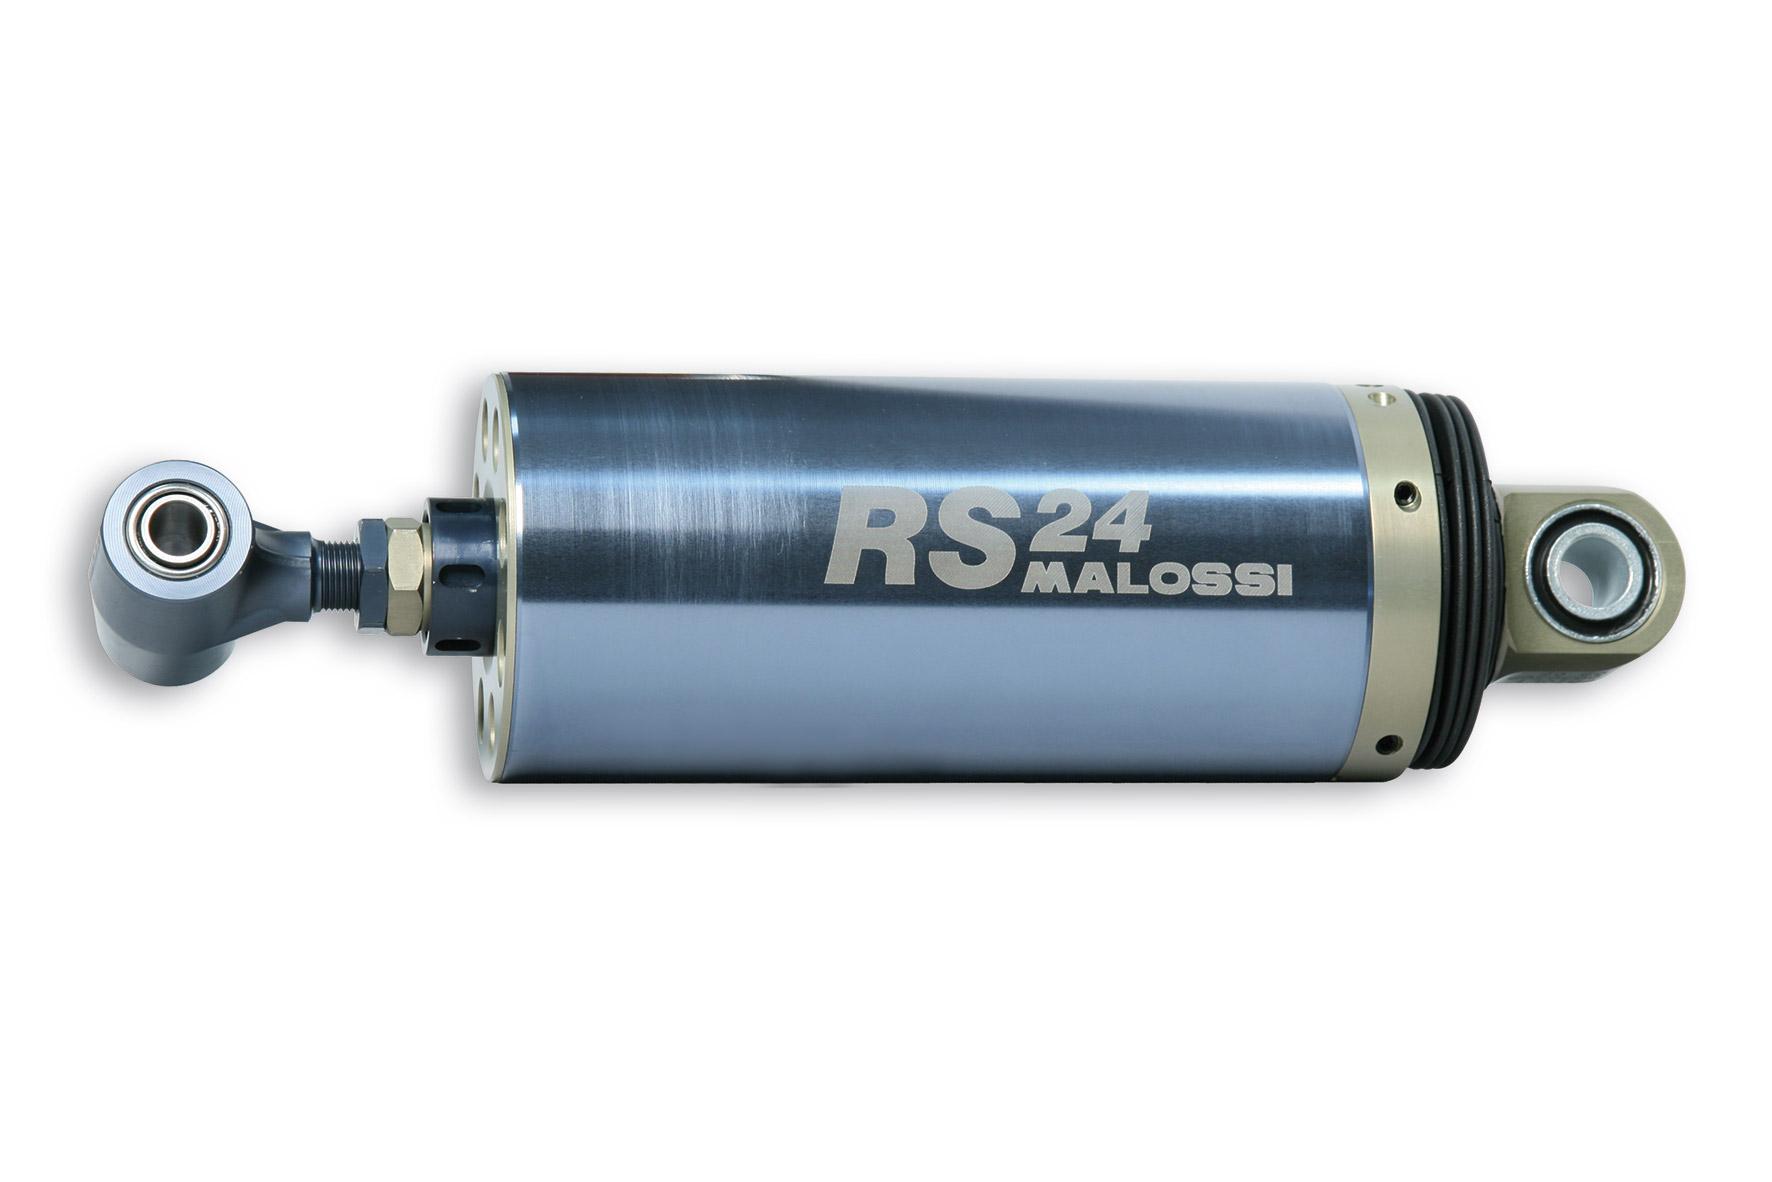 Amortiguador posterior RS24 - distancia entre ejes 316 mm